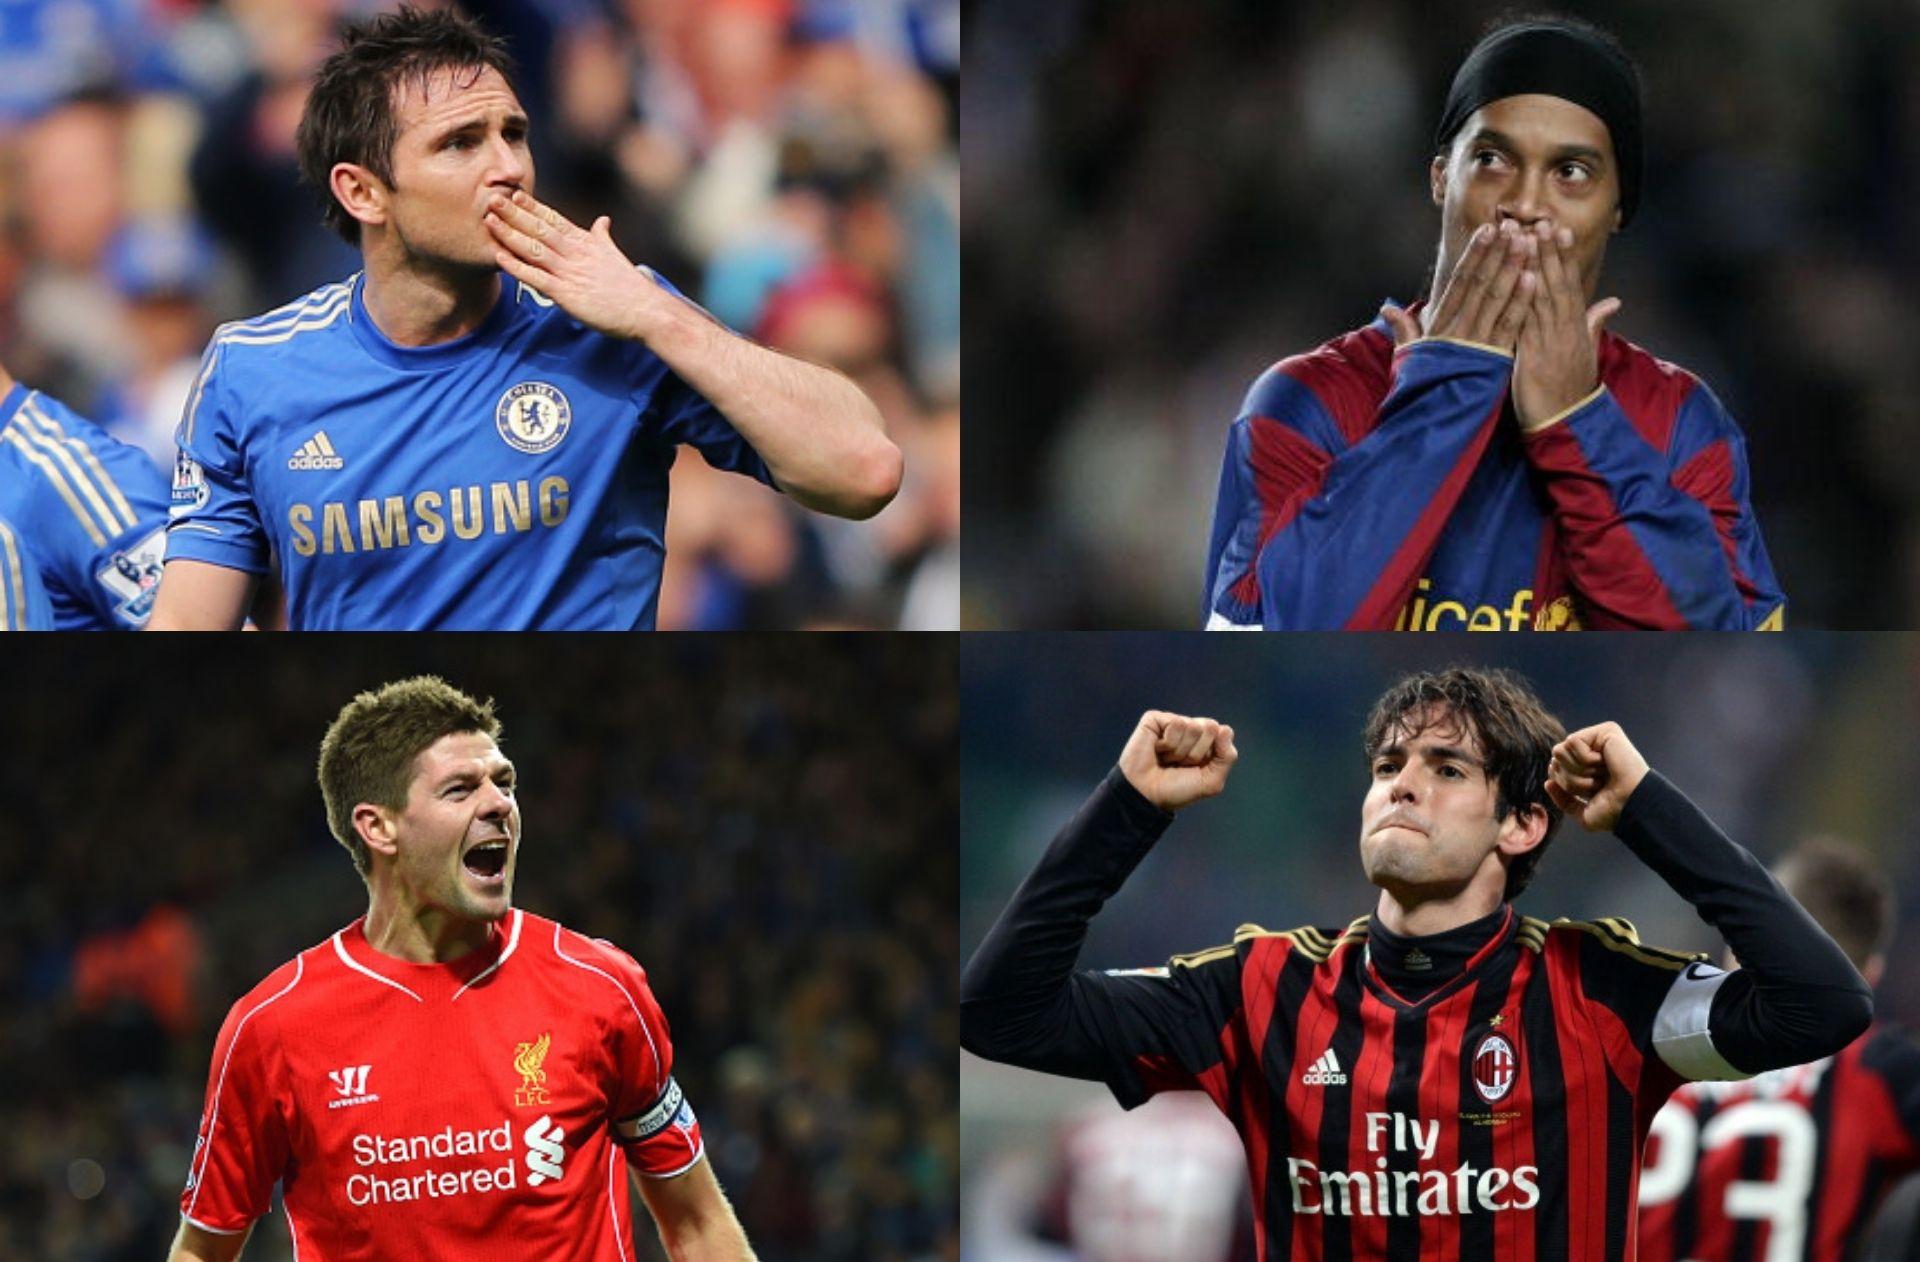 Highest-scoring midfielders of the 21st century